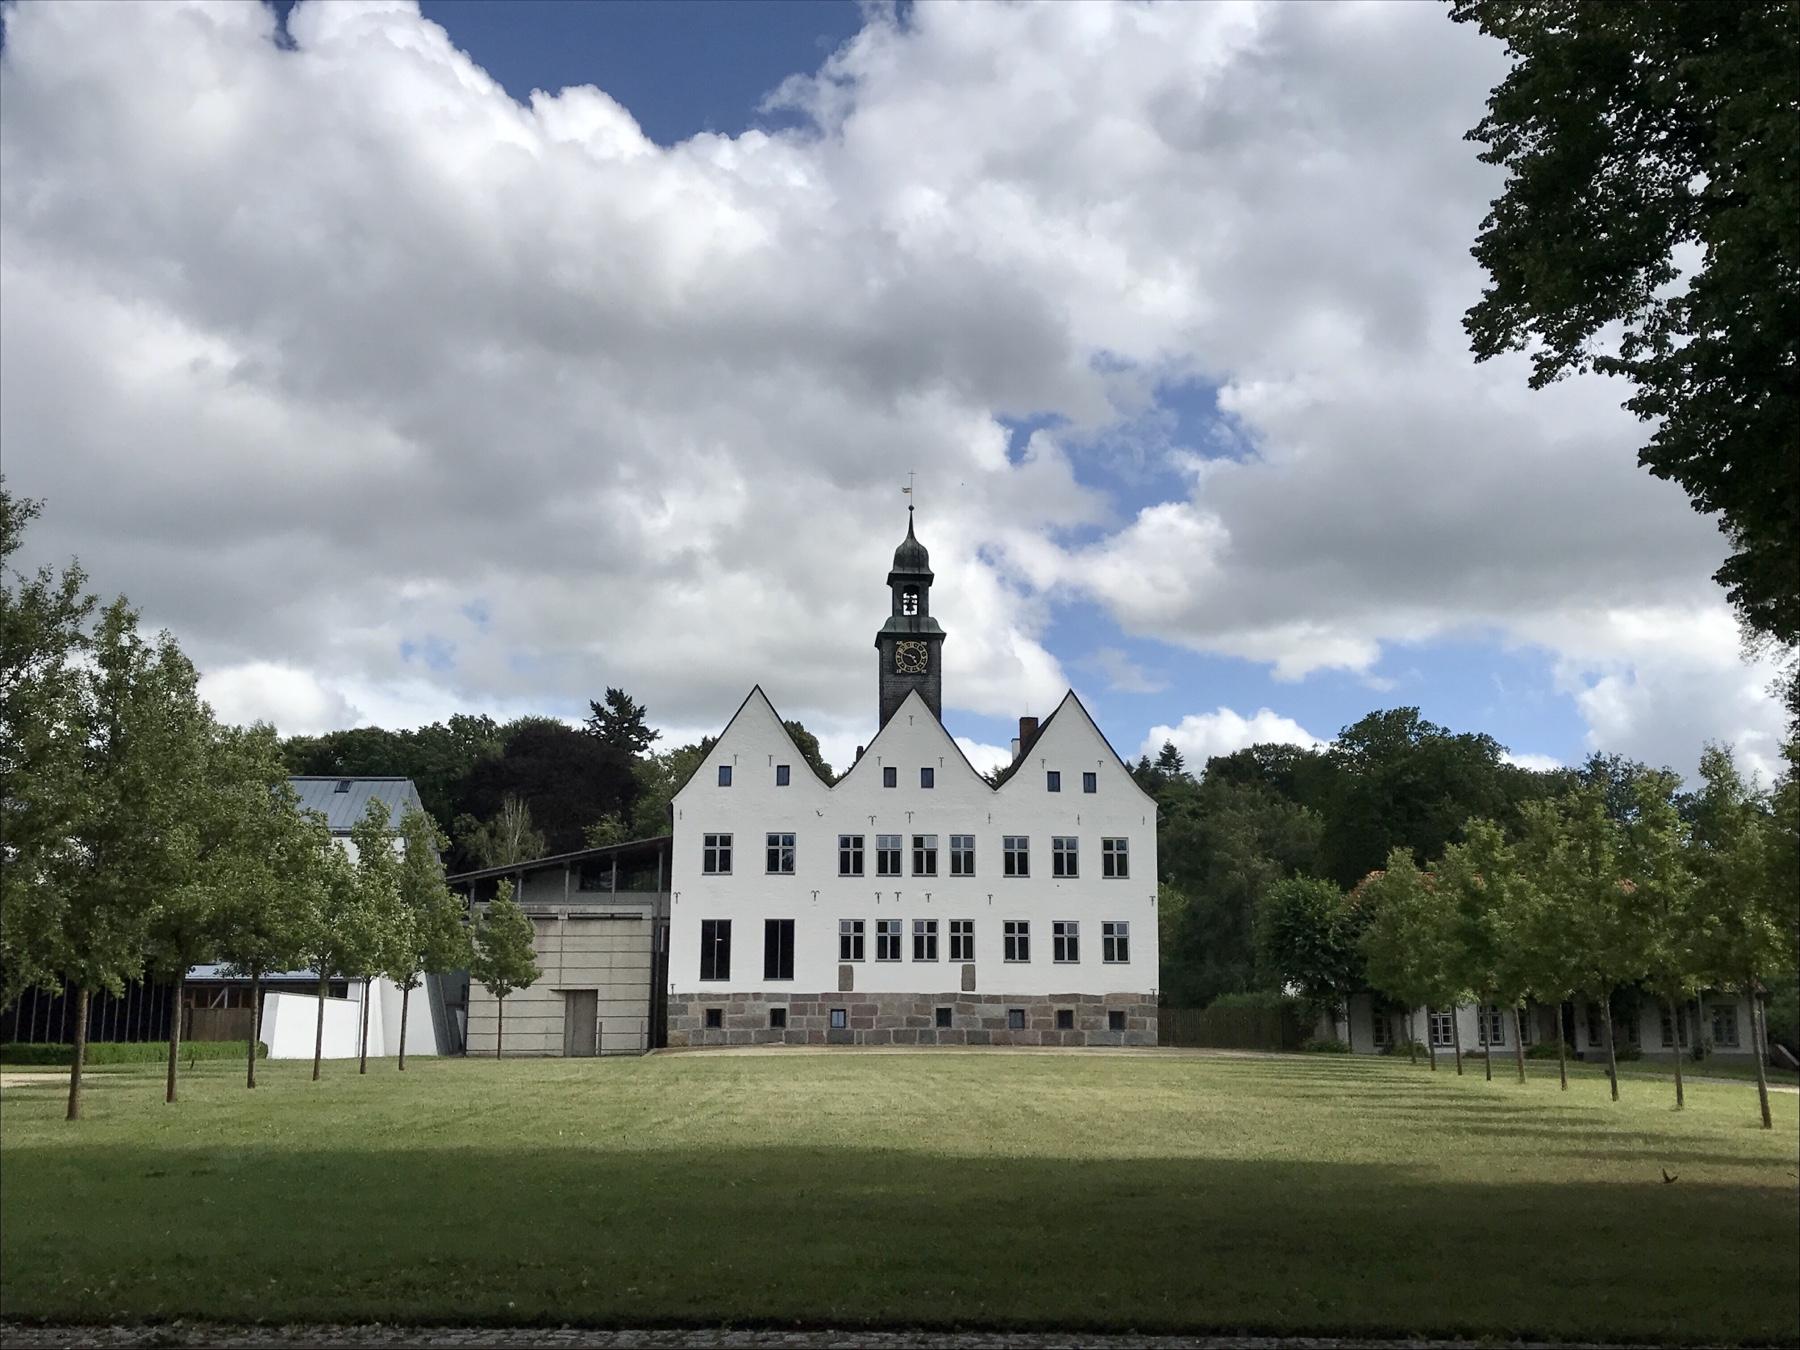 Kloster St. Ansgar Nütschau, Stormarnweg Etappe 4